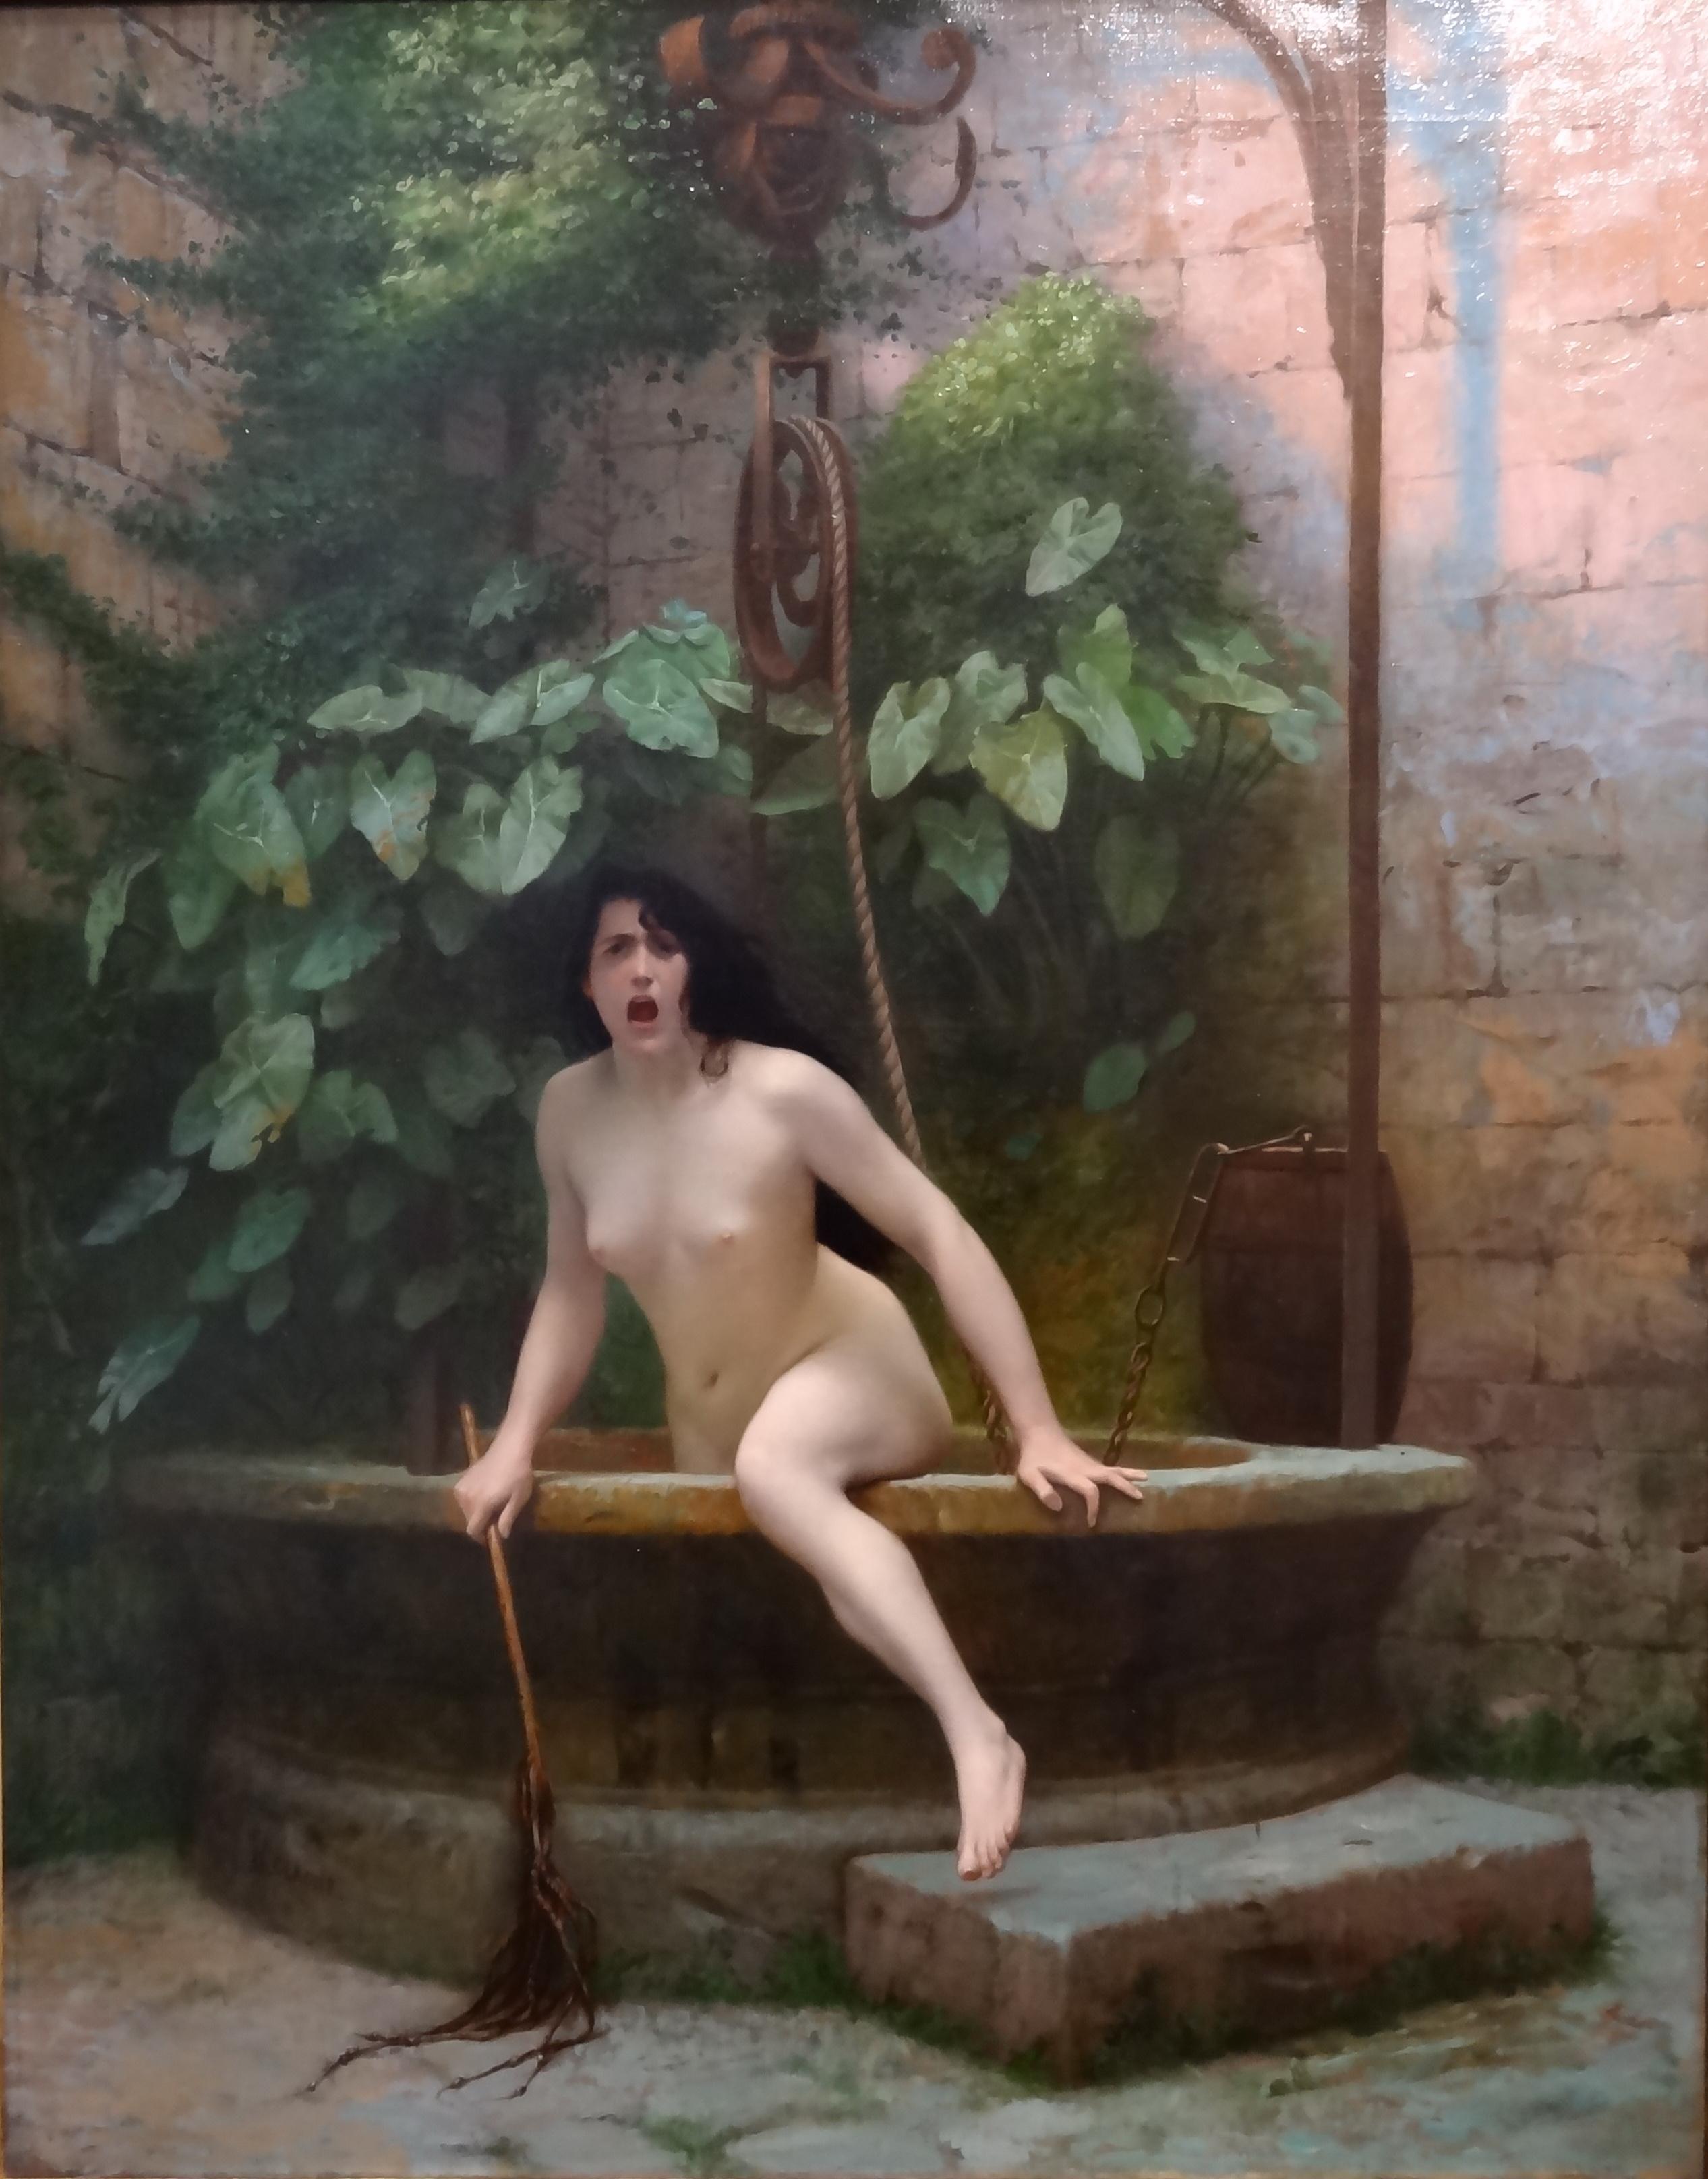 Sword of truth nude art